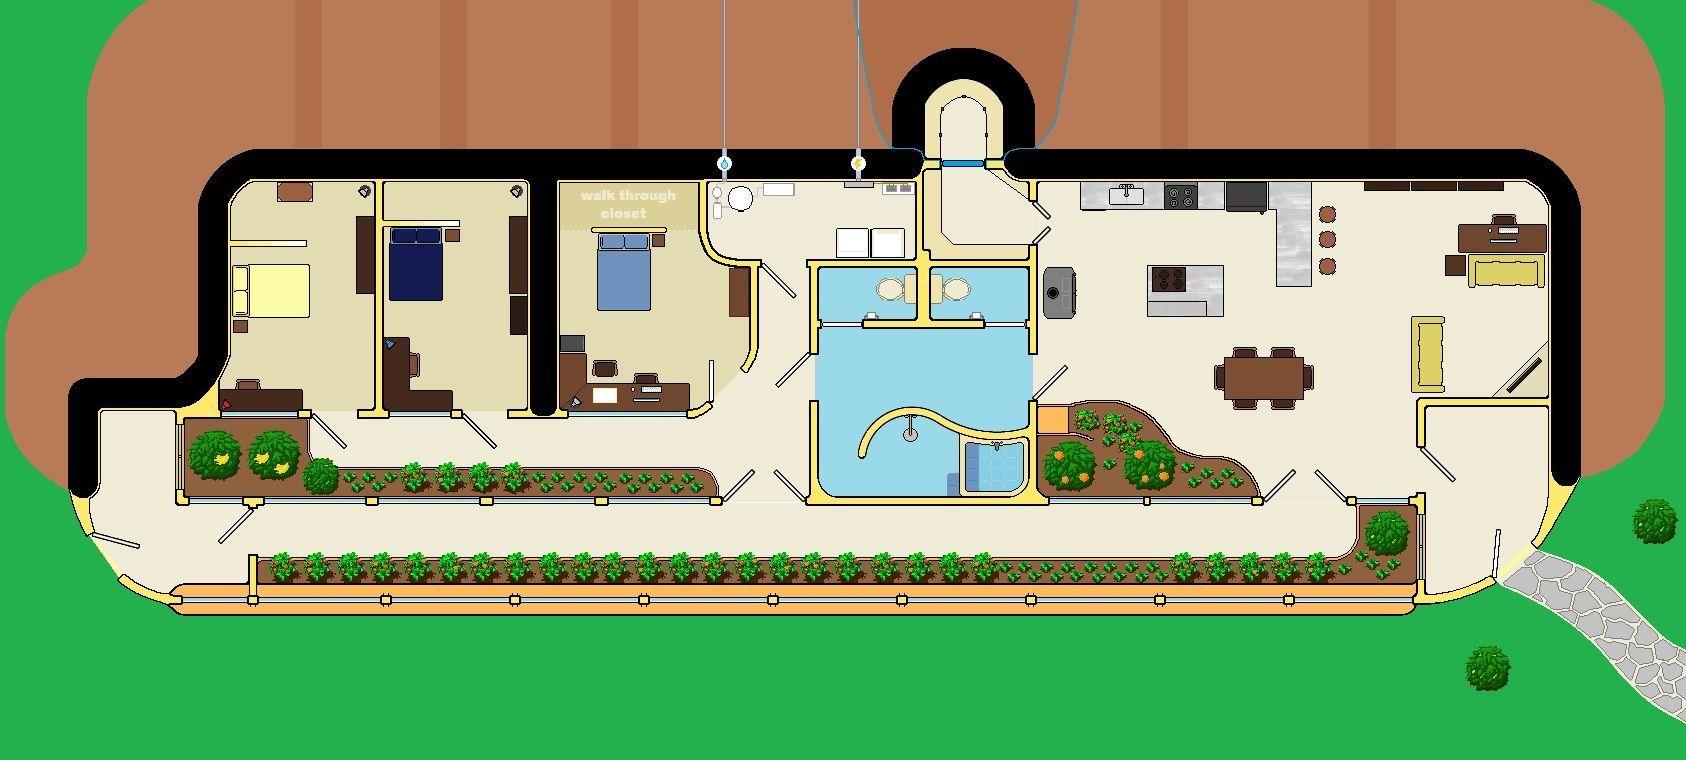 Small Earthship House Plans Archivosweb Com With Images Earthship Home Earthship Plans Earthship Home Plans